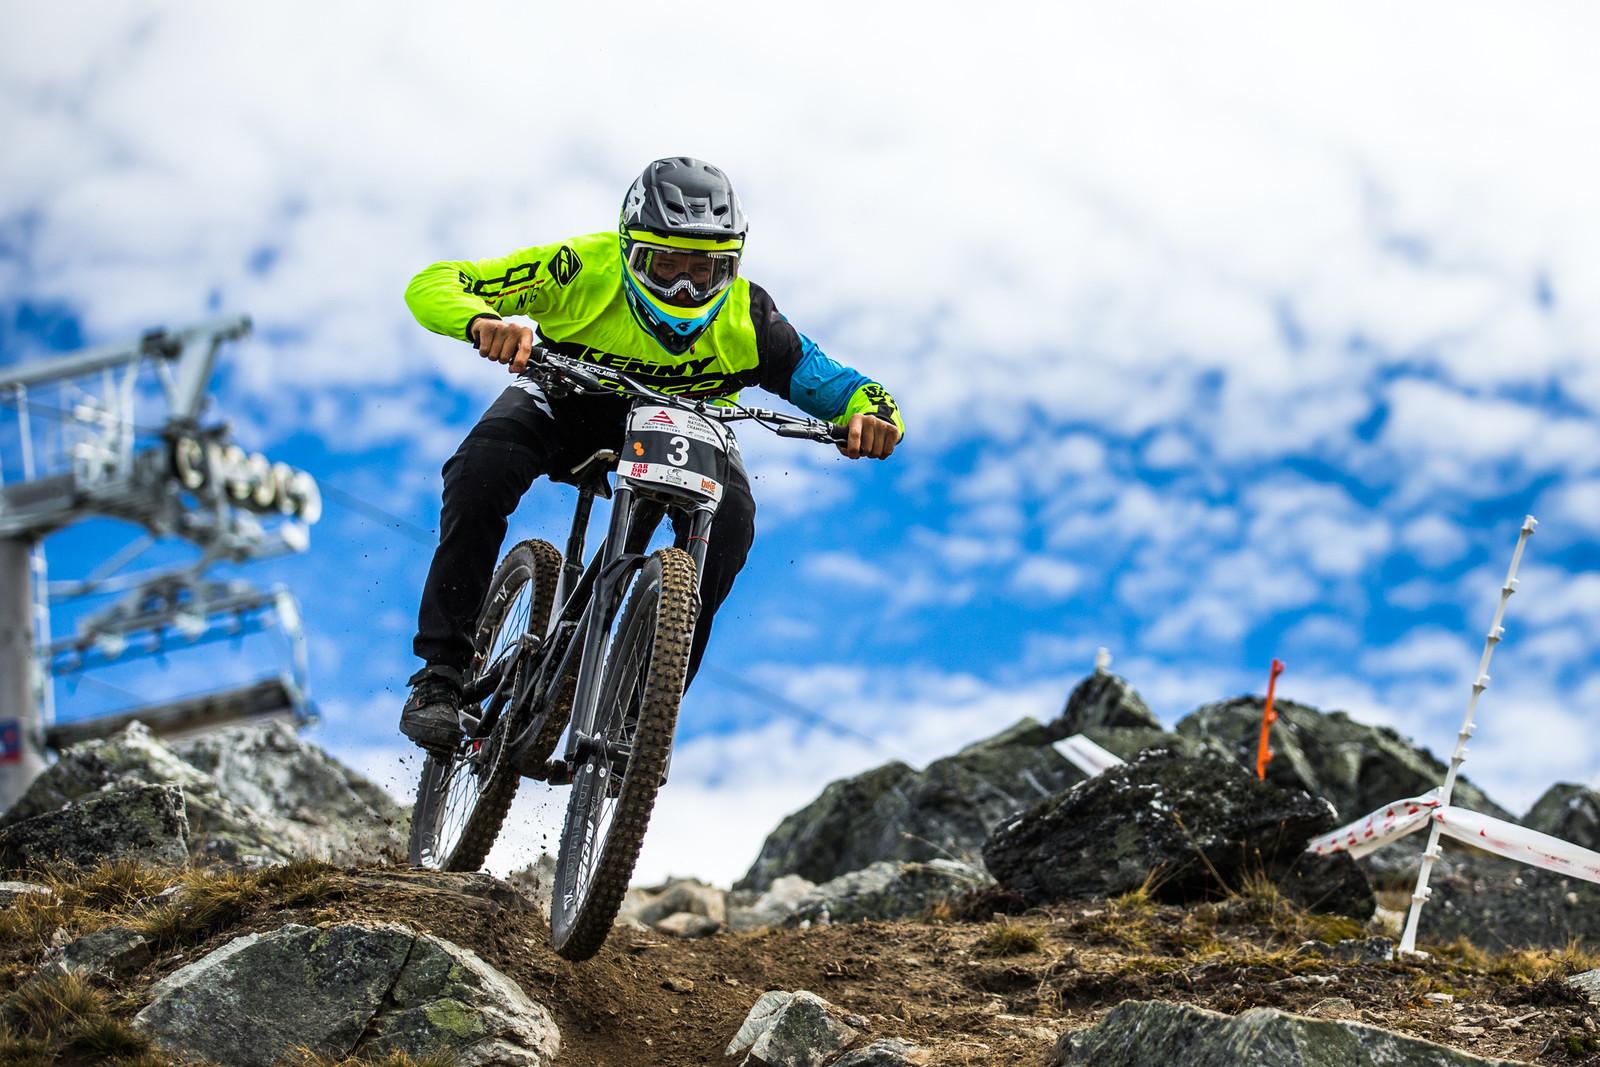 Sam Blenkinsop Running All Kinds of New Goodies - Blenki, Brook & More - 2018 NZ National Champs Day 1 - Mountain Biking Pictures - Vital MTB